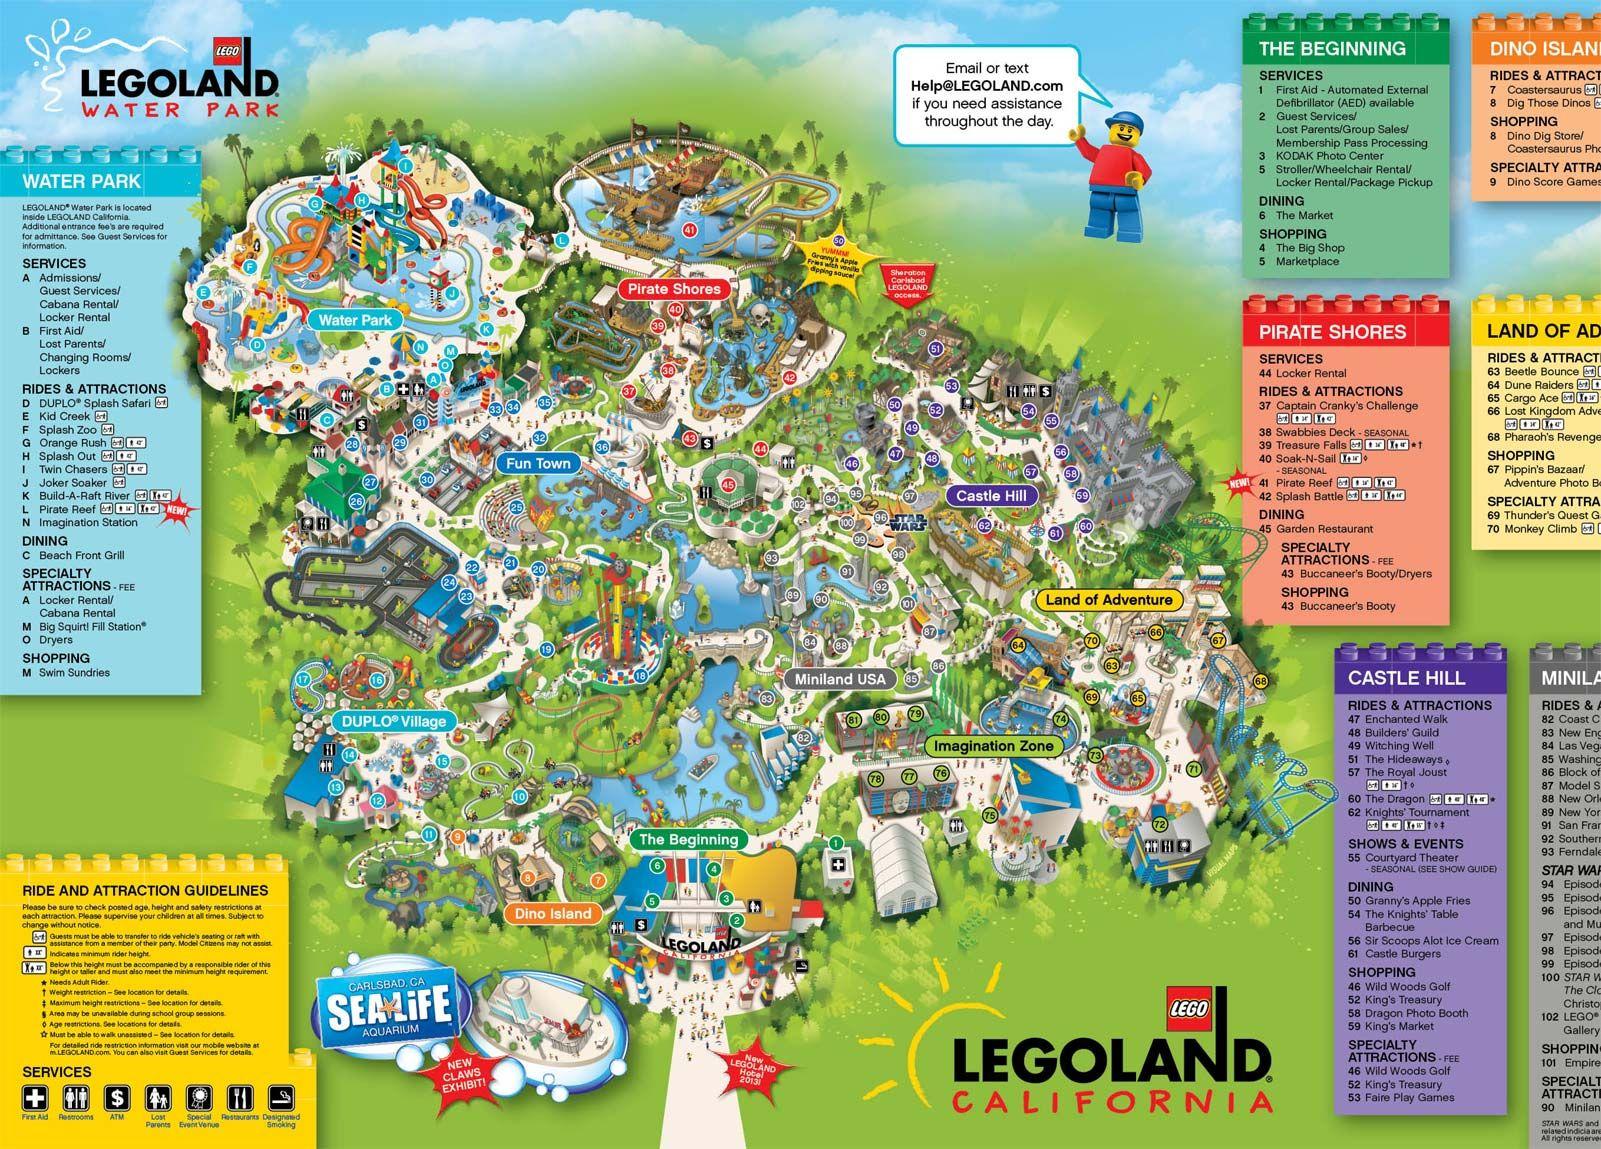 Legoland California Map | Disneyland! | Pinterest | Legoland - Legoland Map California Pdf